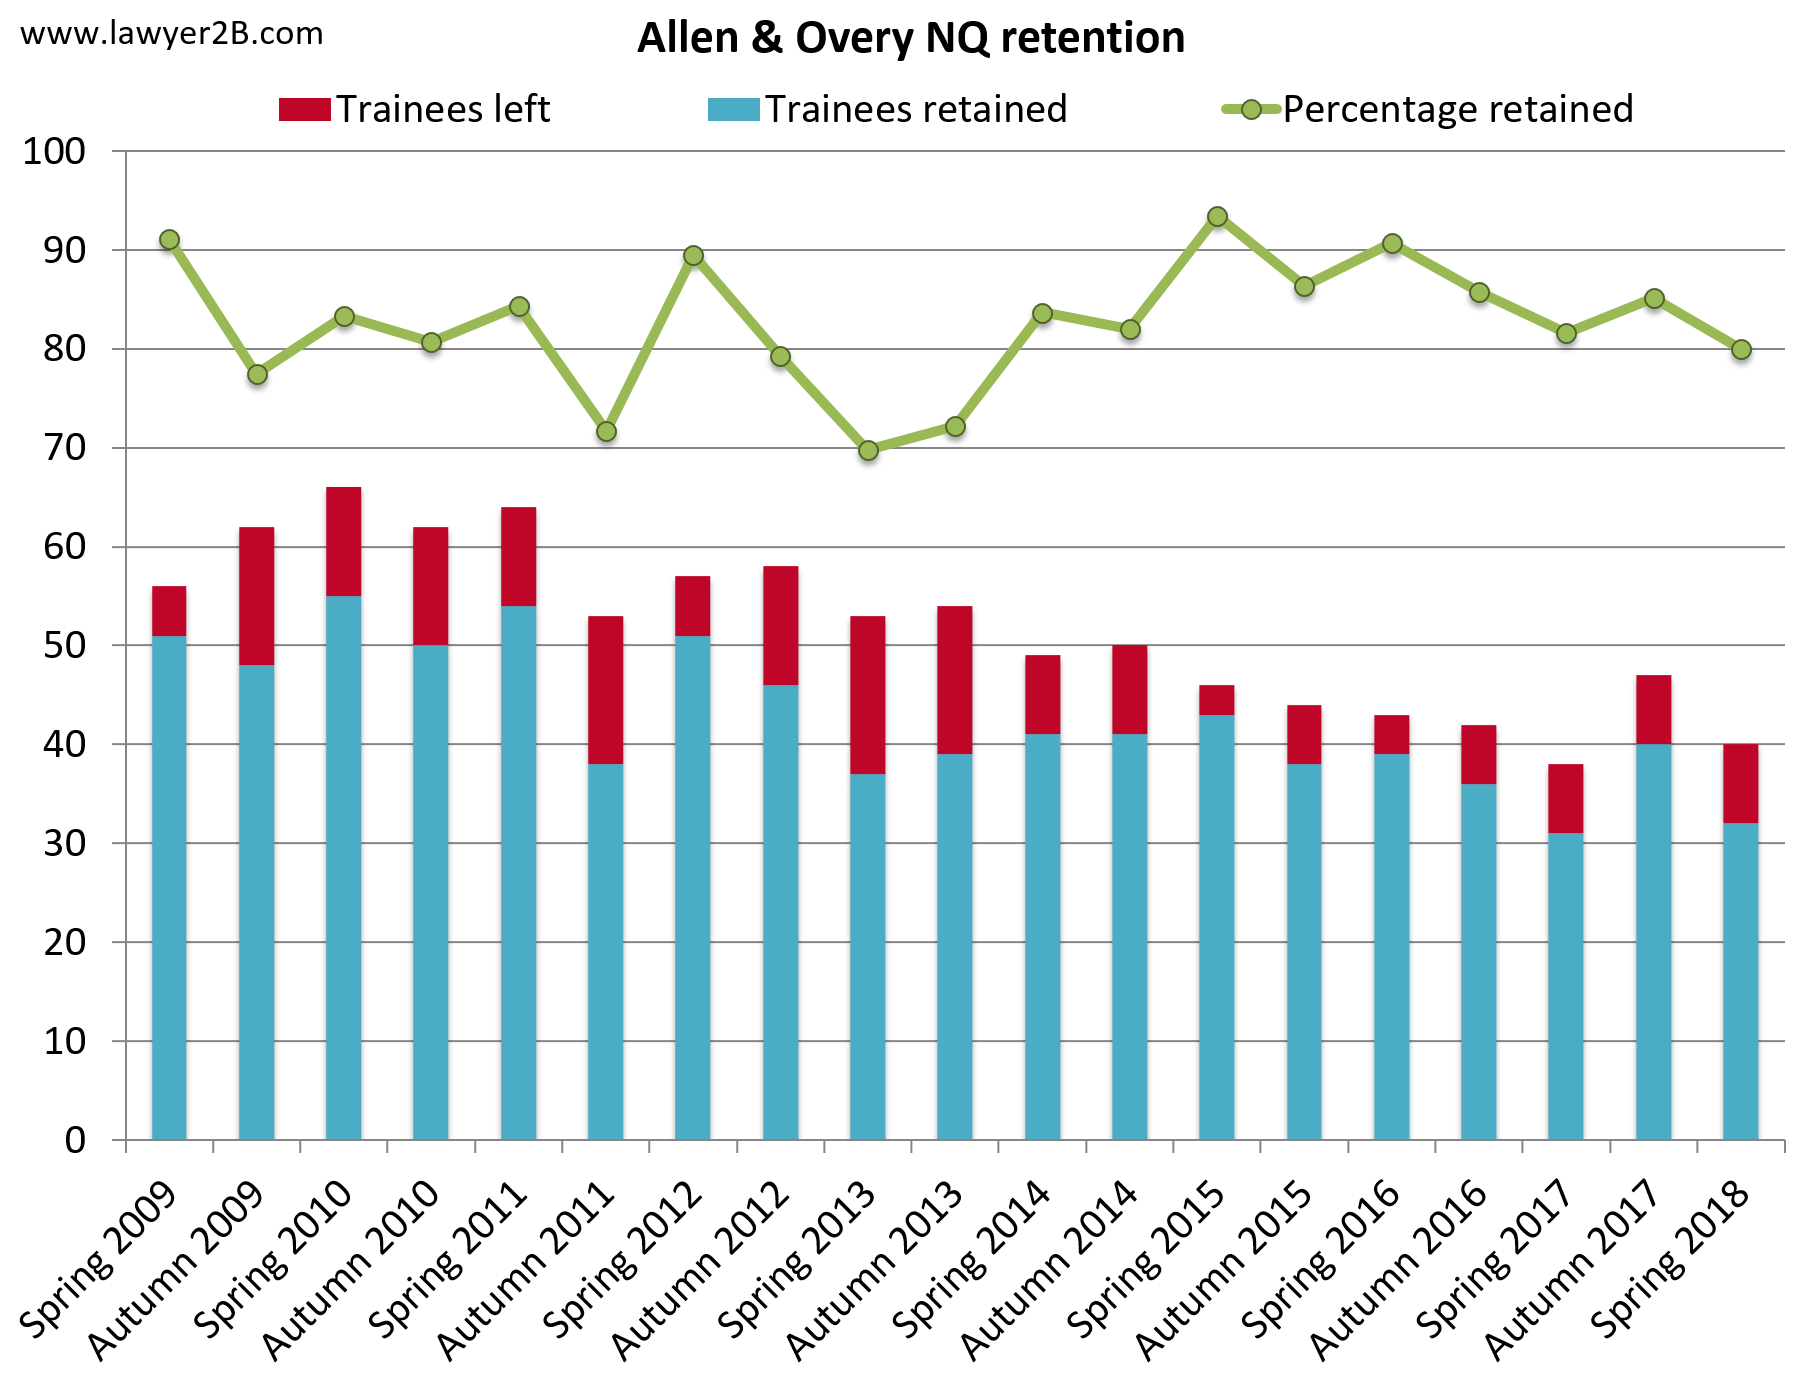 Allen & Overy retention 2018